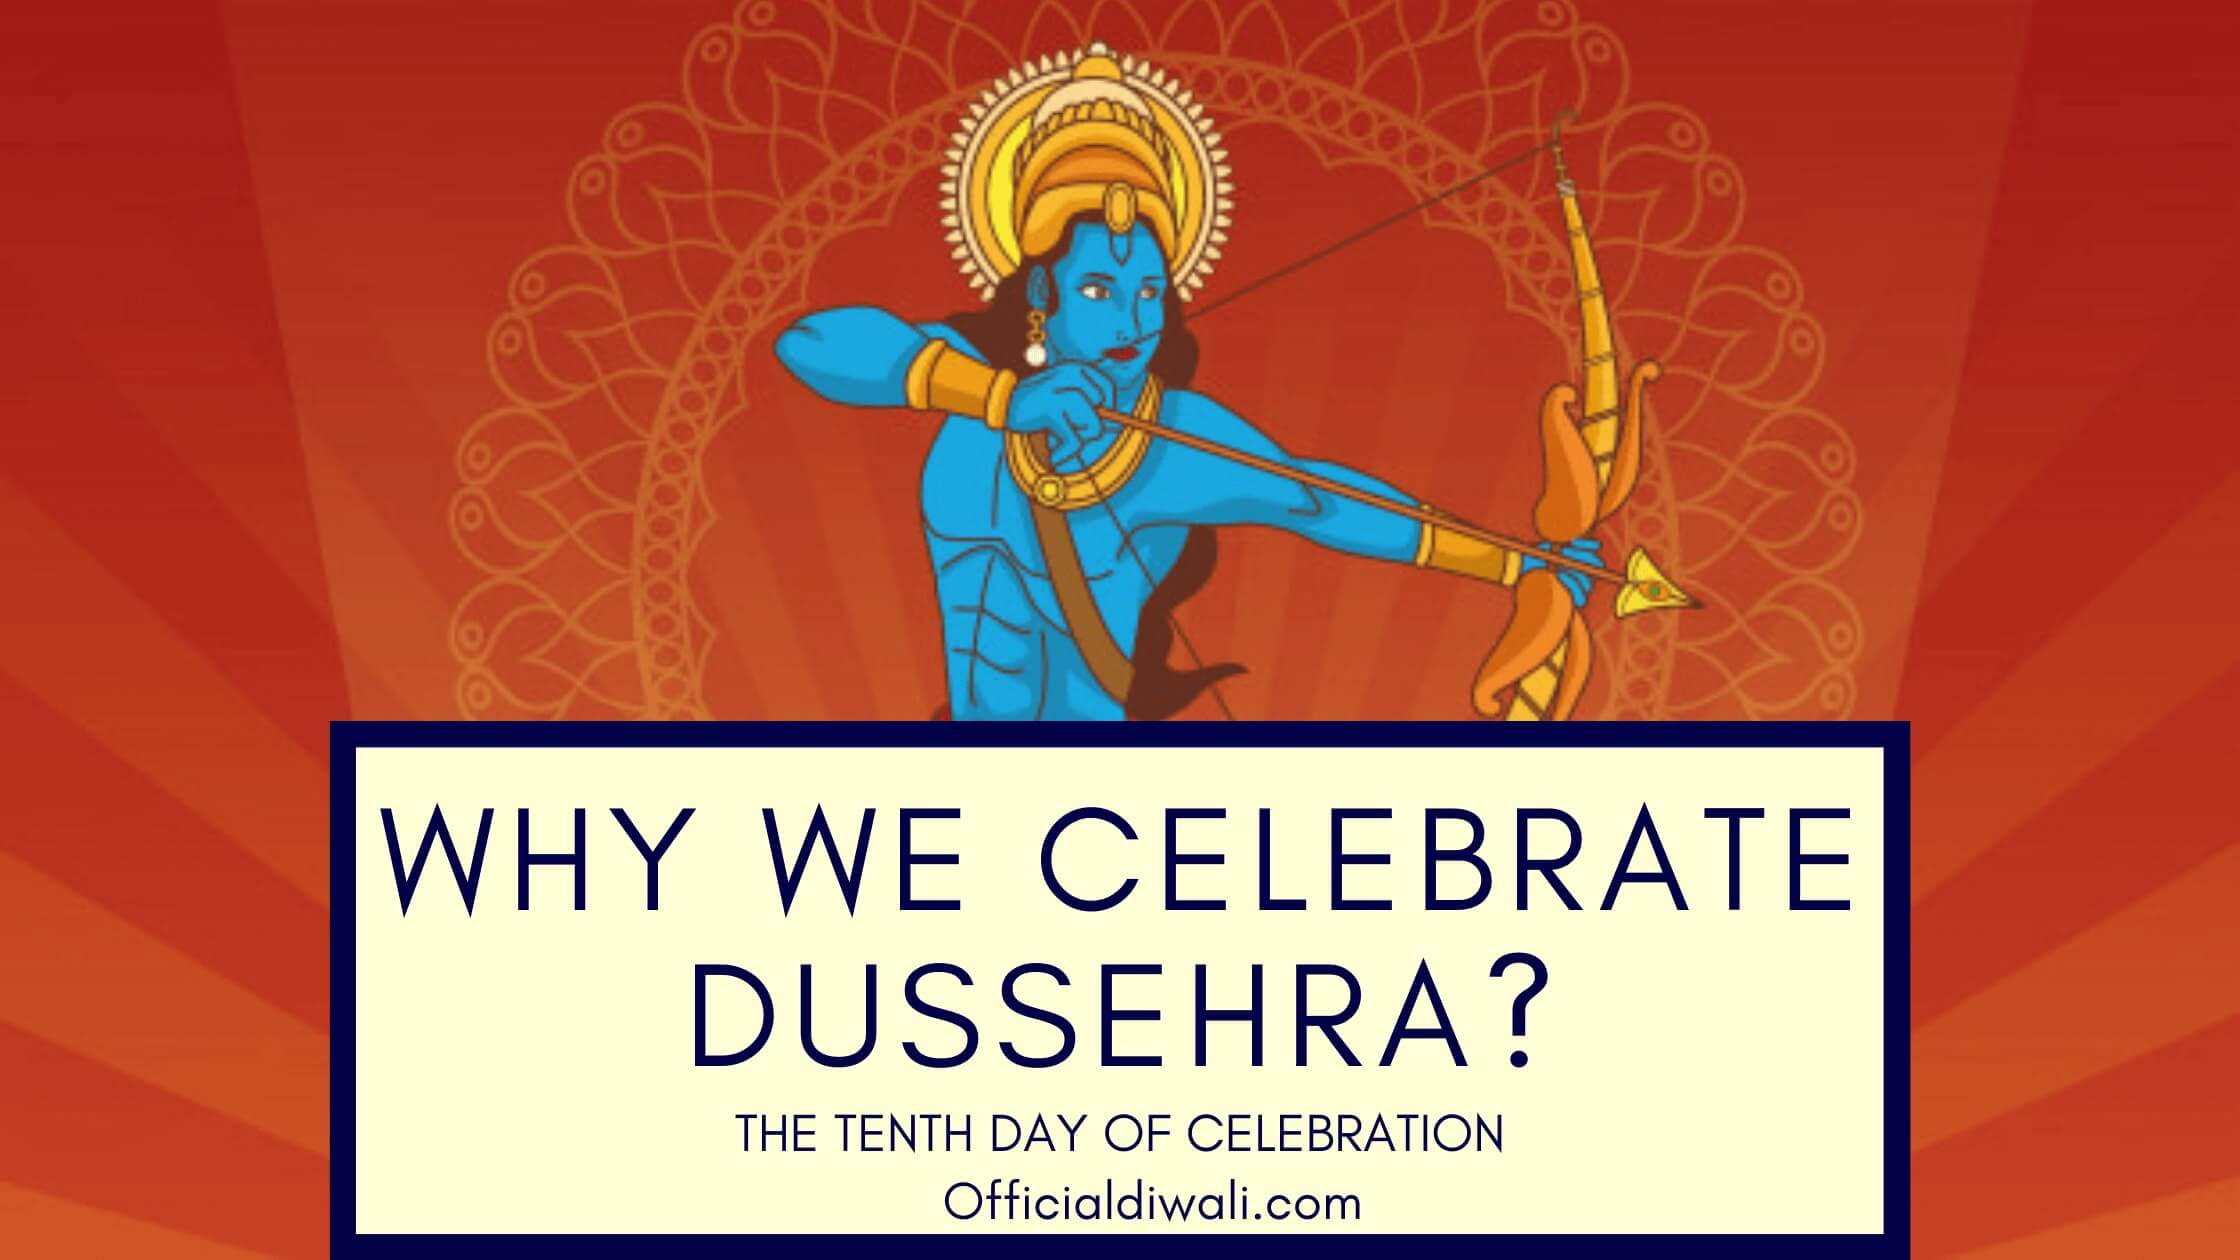 Why we celebrate Dussehra/Vijayadashami? – The Tenth Day Of Celebration